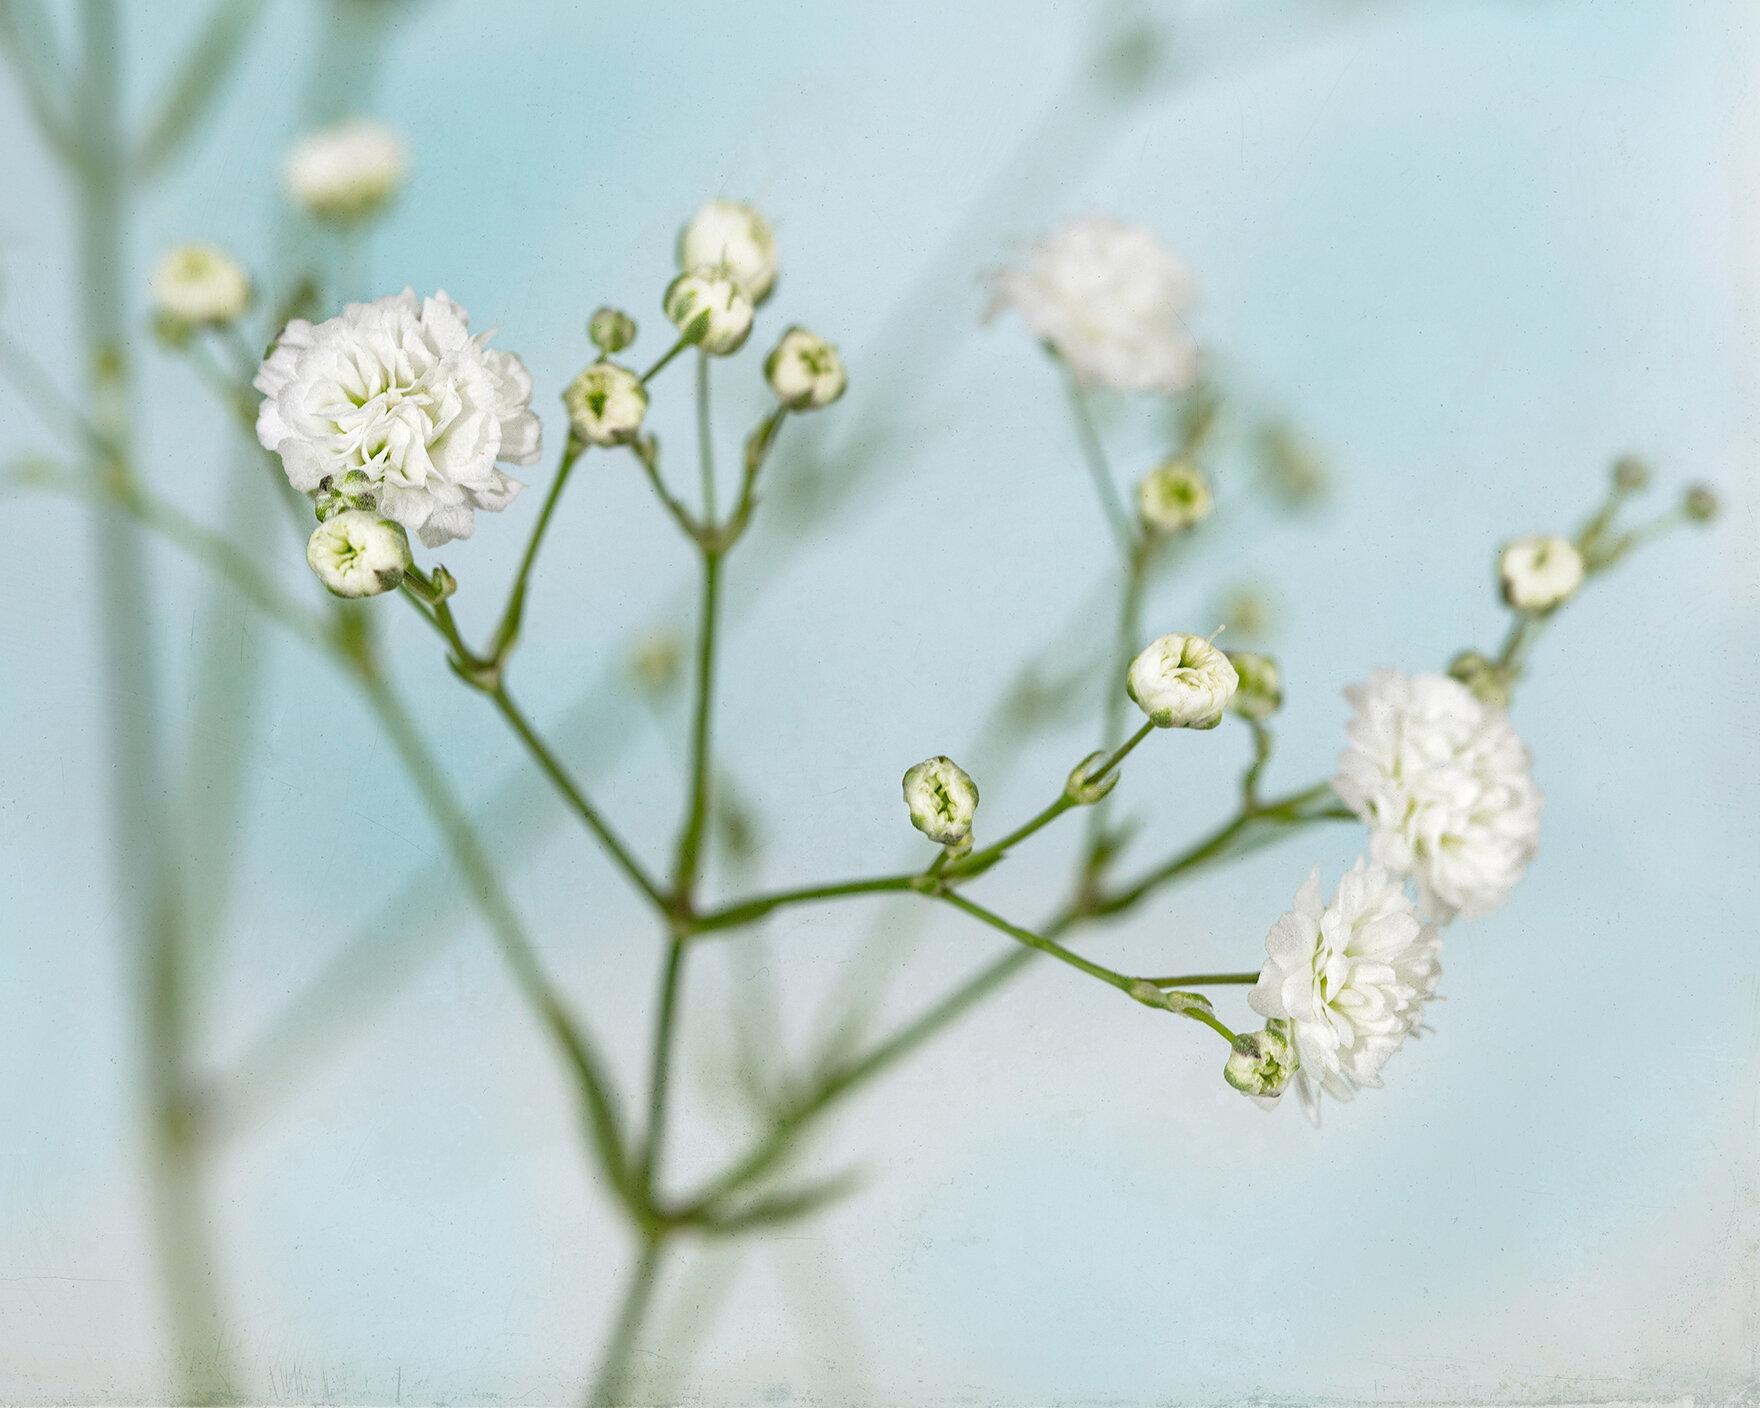 laura_farrell_photography_babys_breath_studio_flowers_blue_1500w.jpg